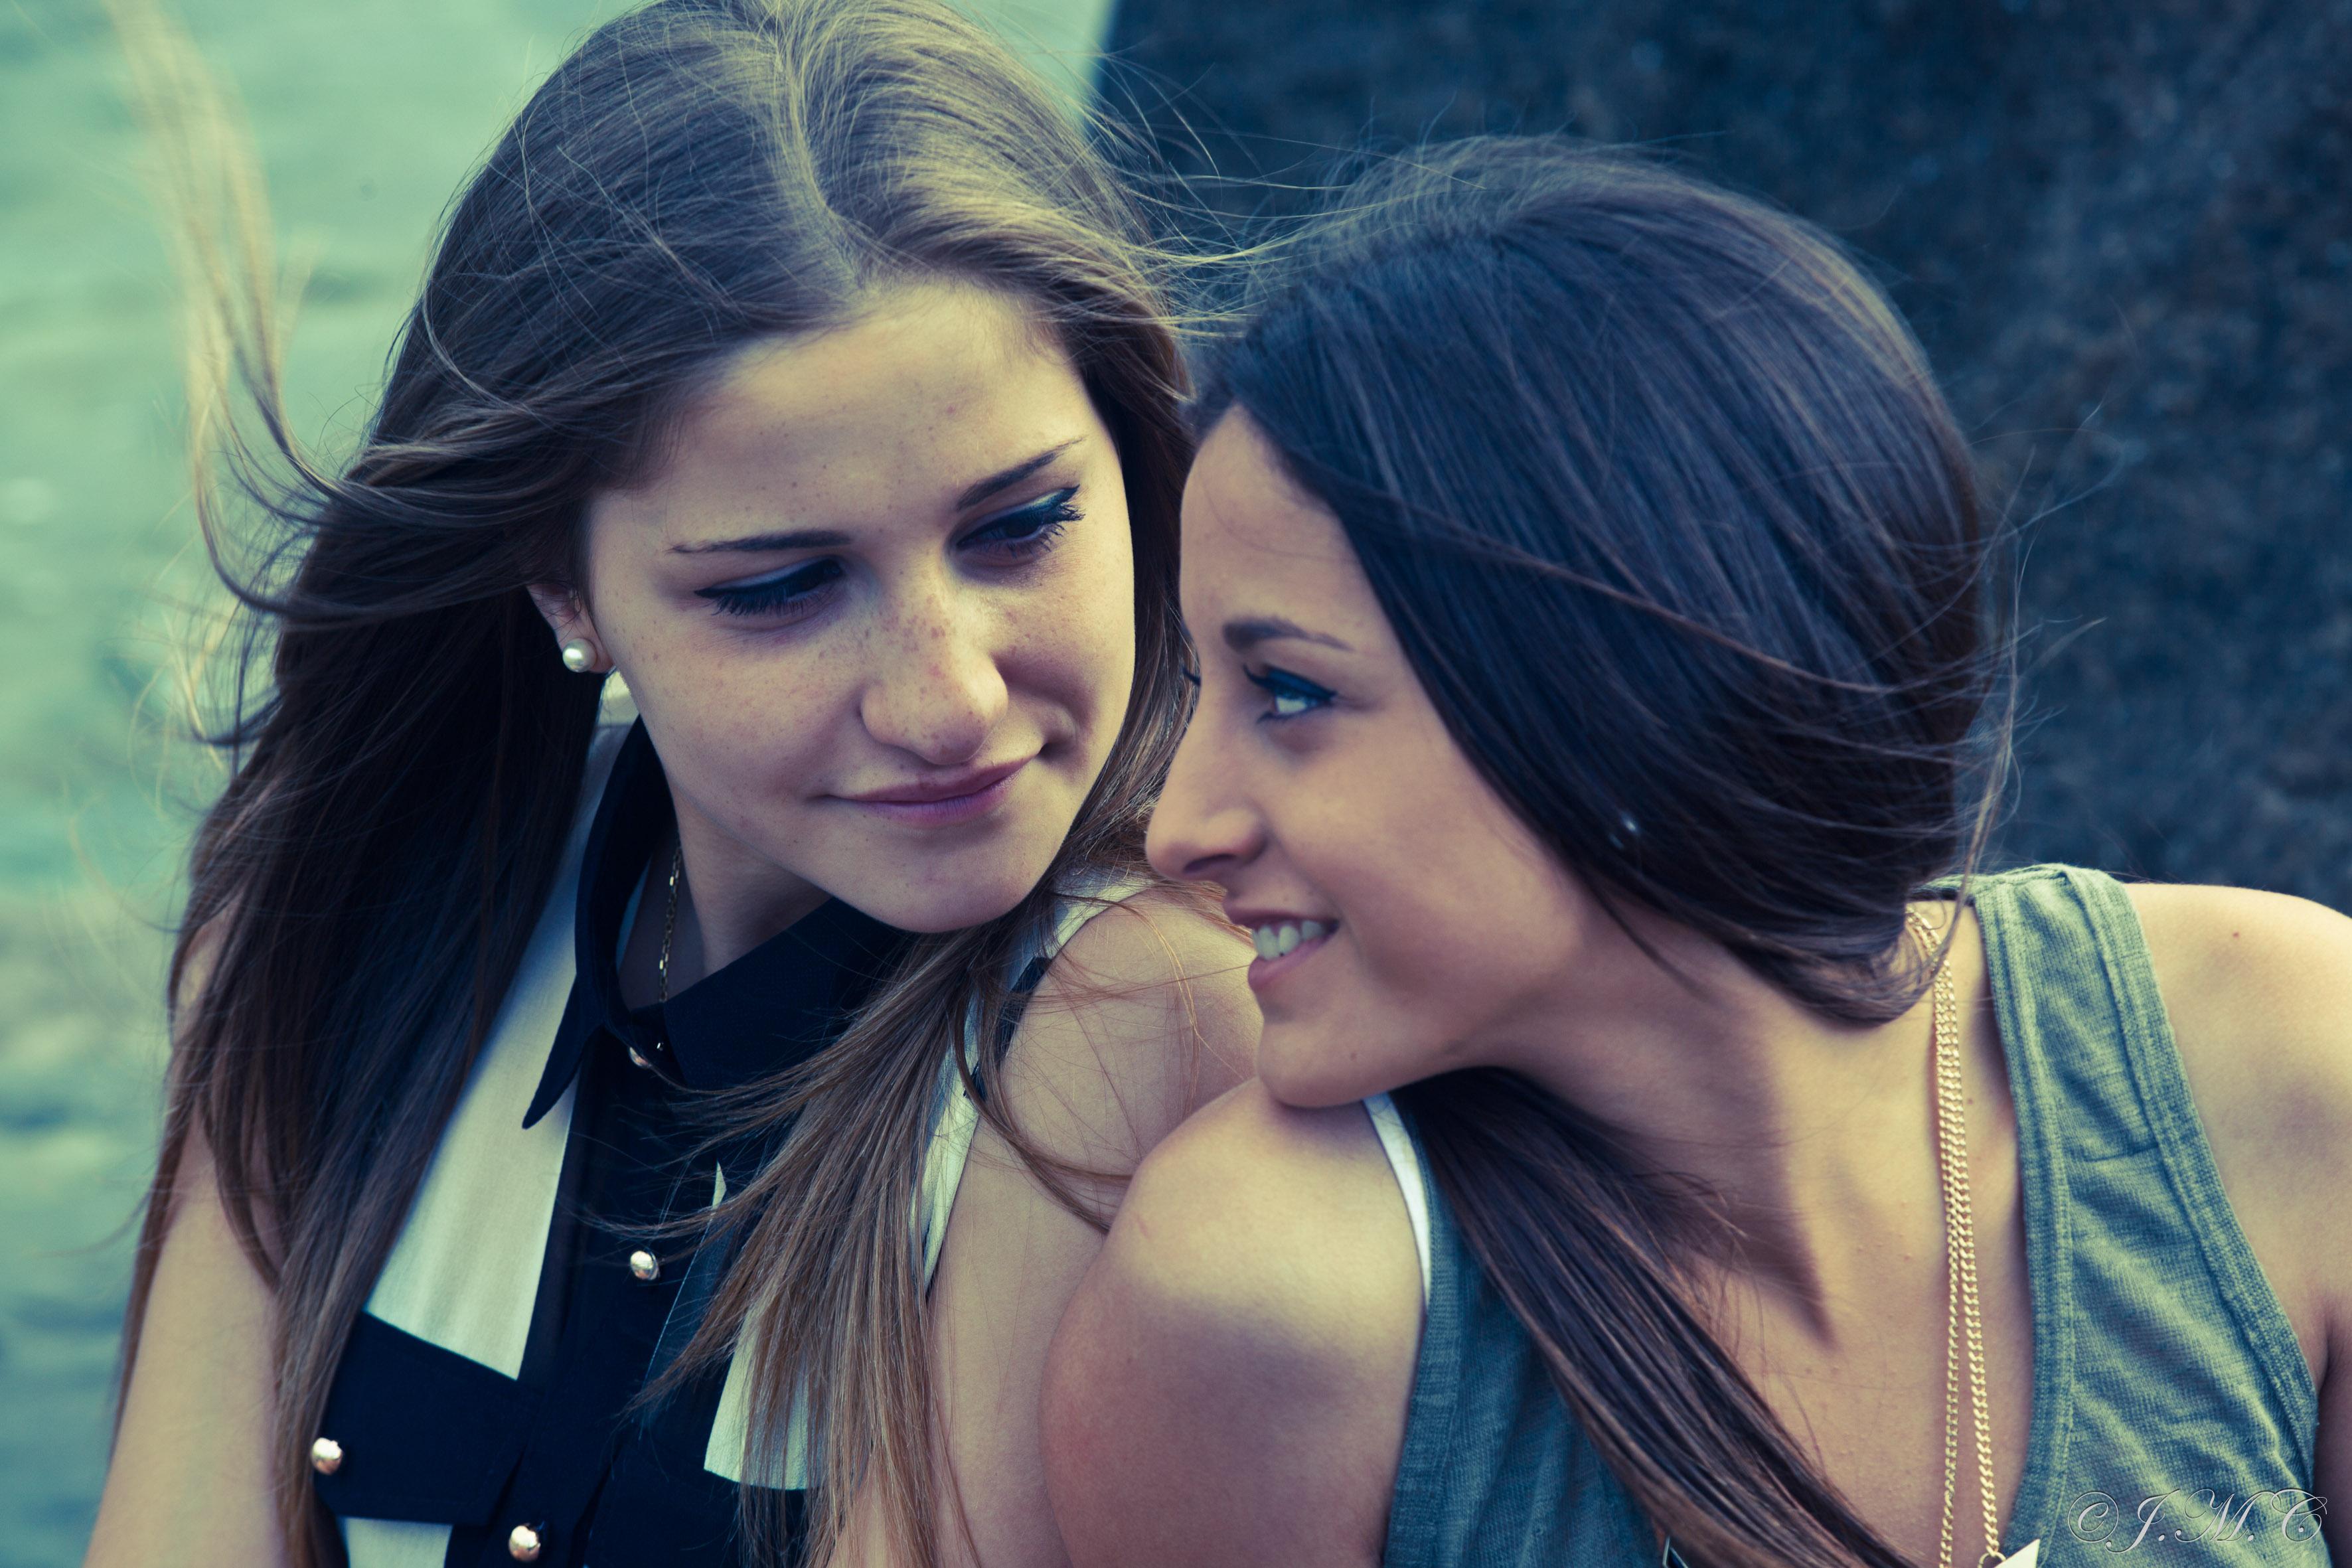 Diana et Catarina